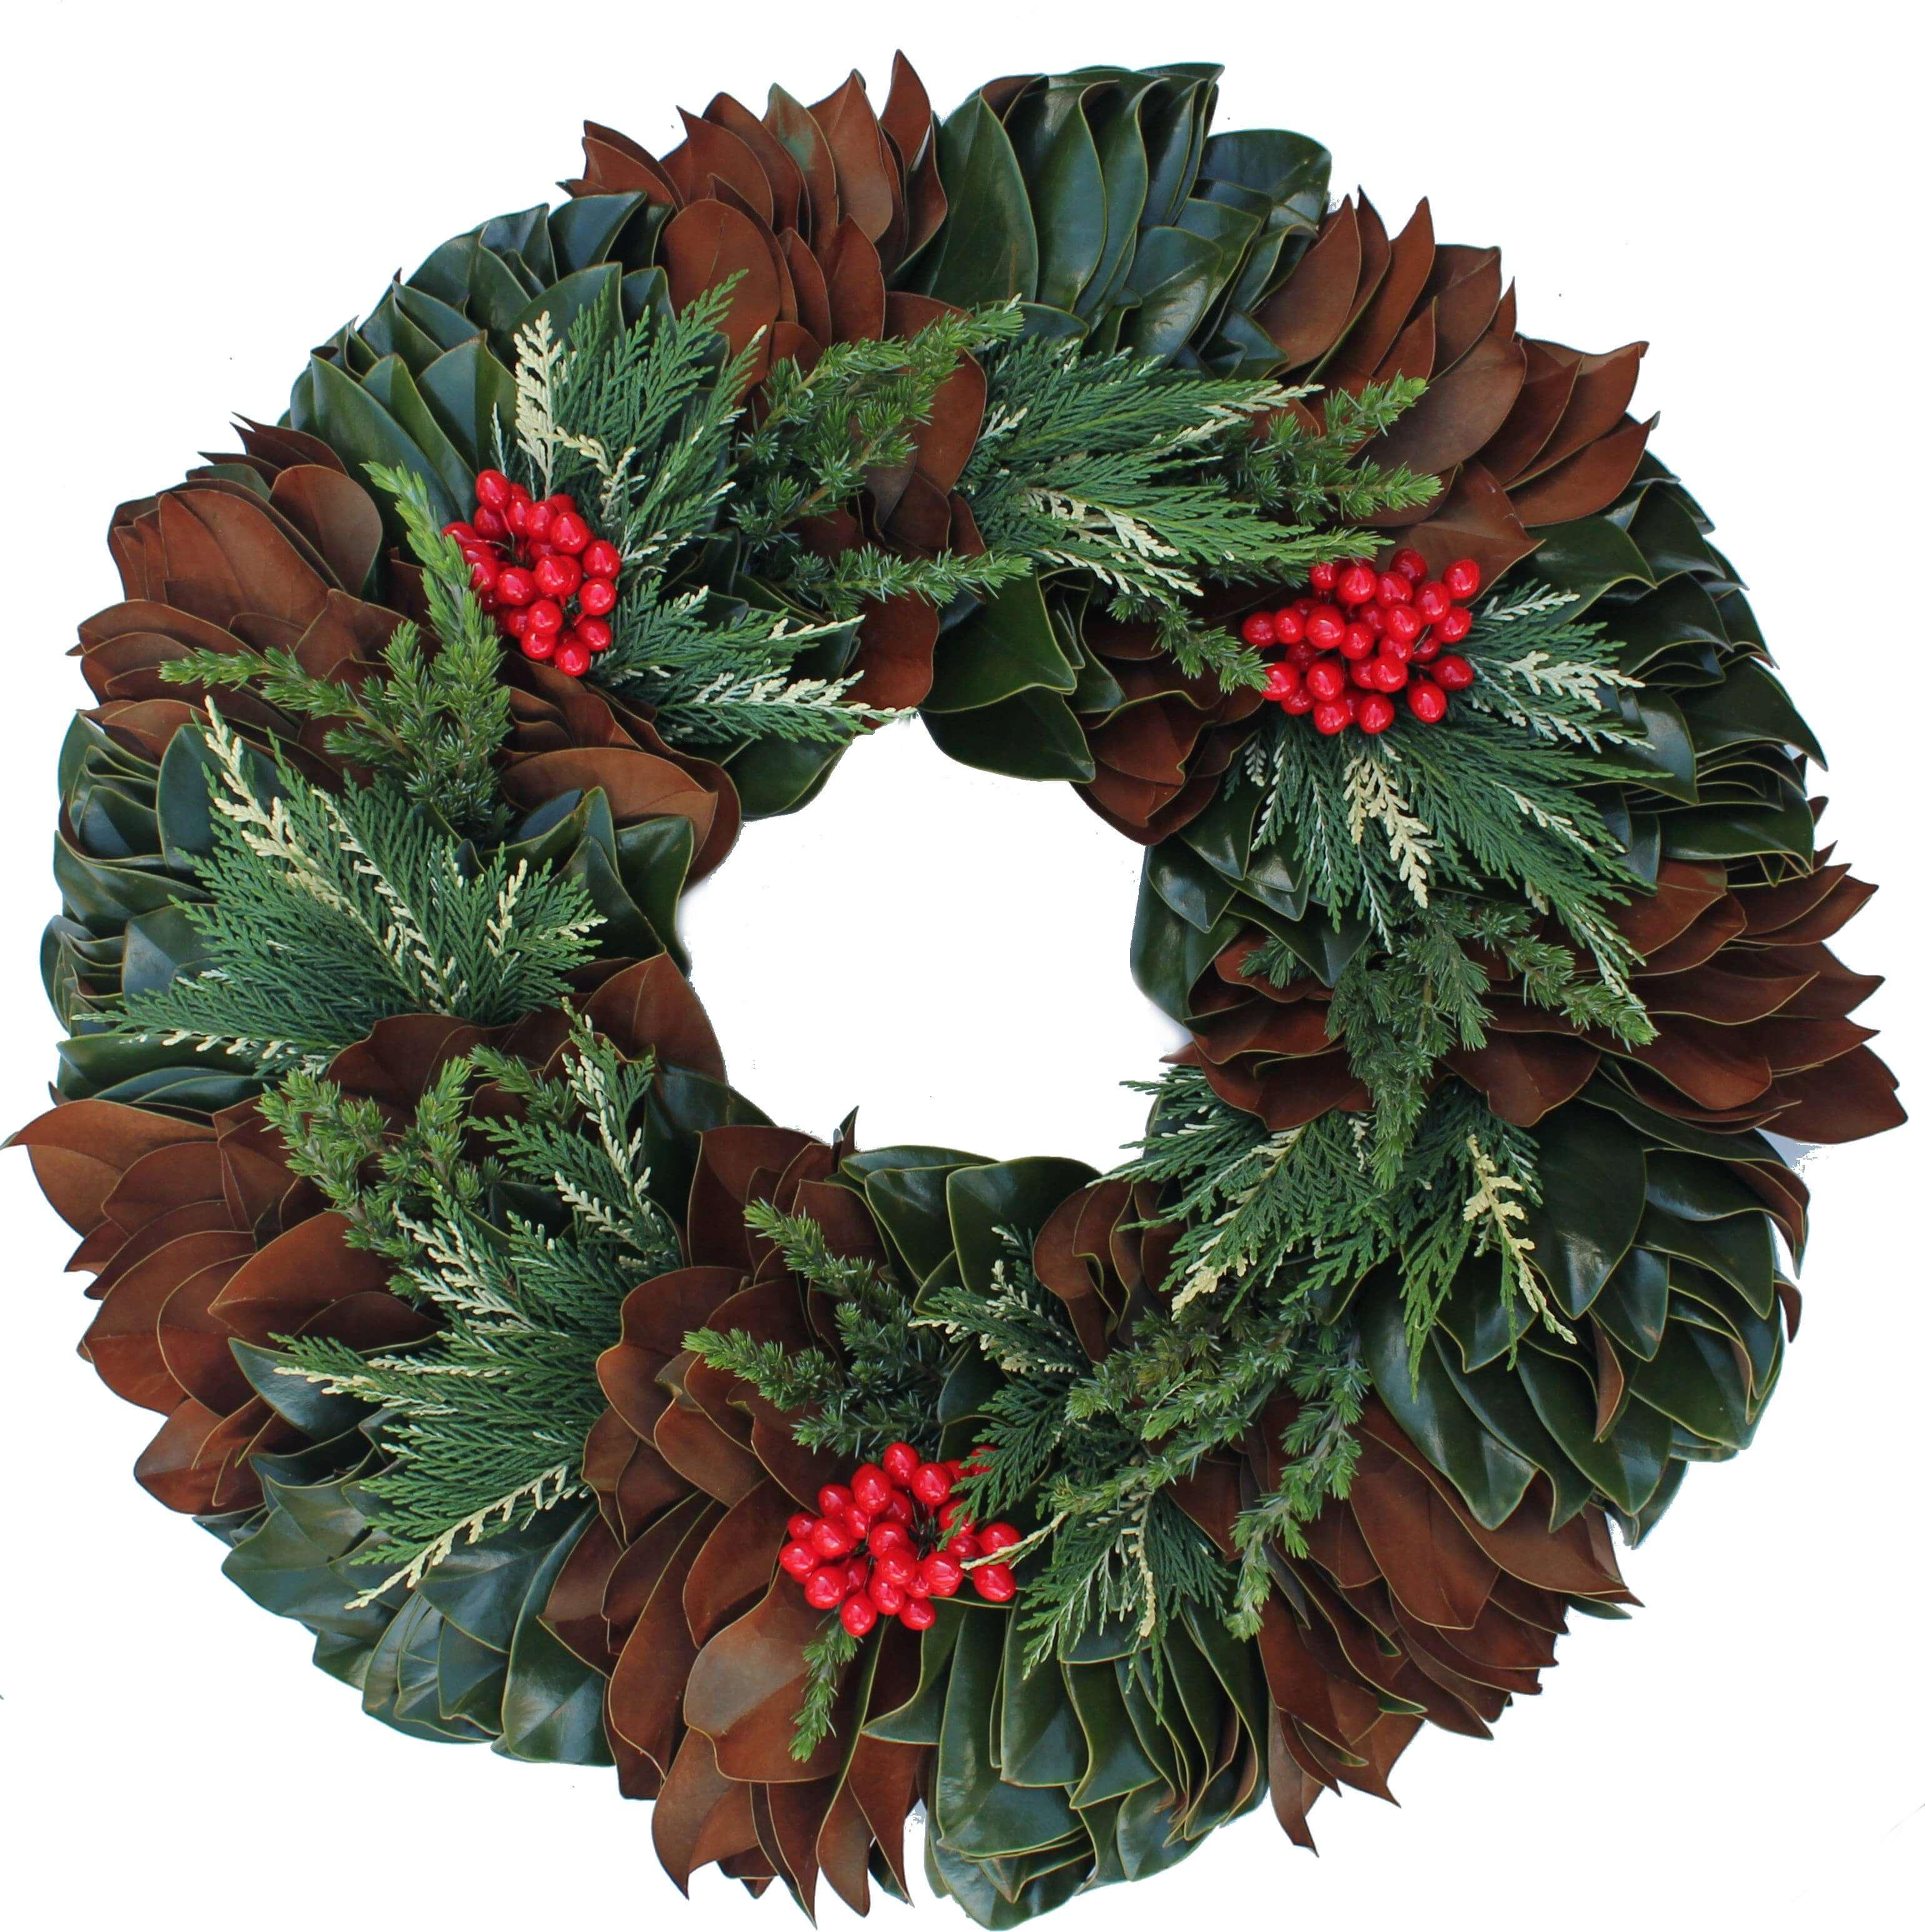 Magnolia Variegated Leyland & Ming Pine Christmas Wreath